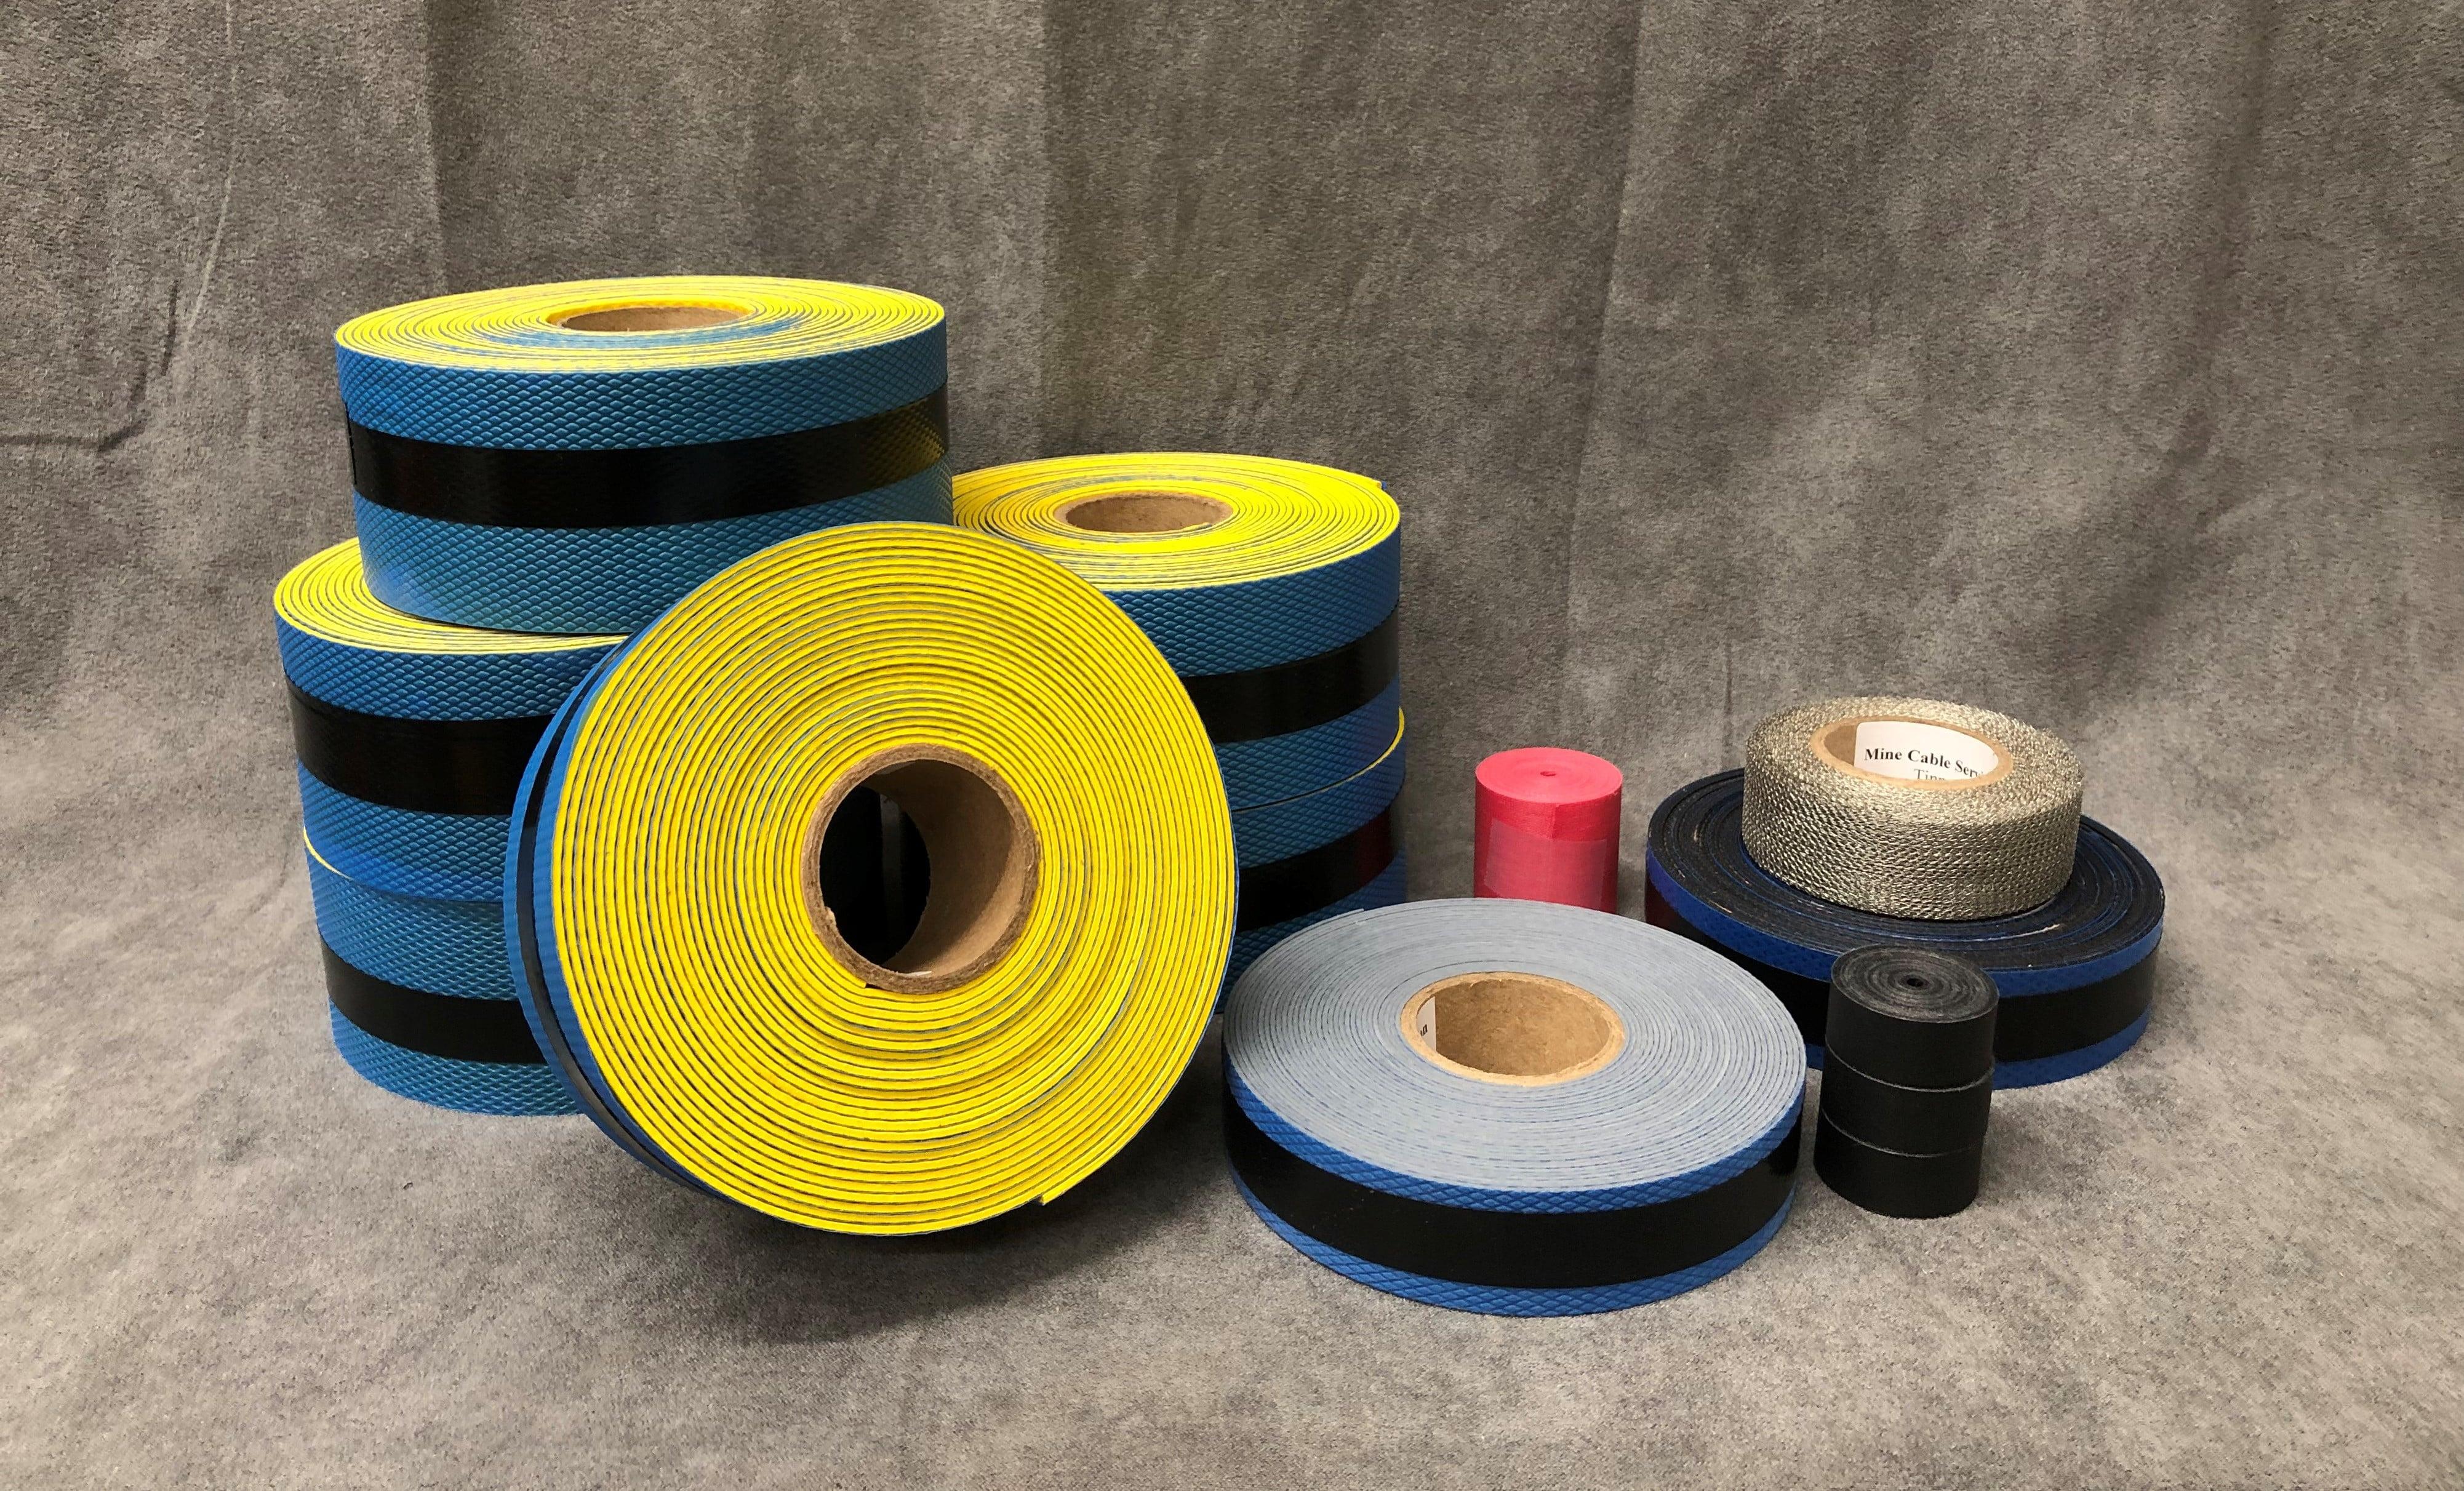 mcs-cable-repair-materials-supplies